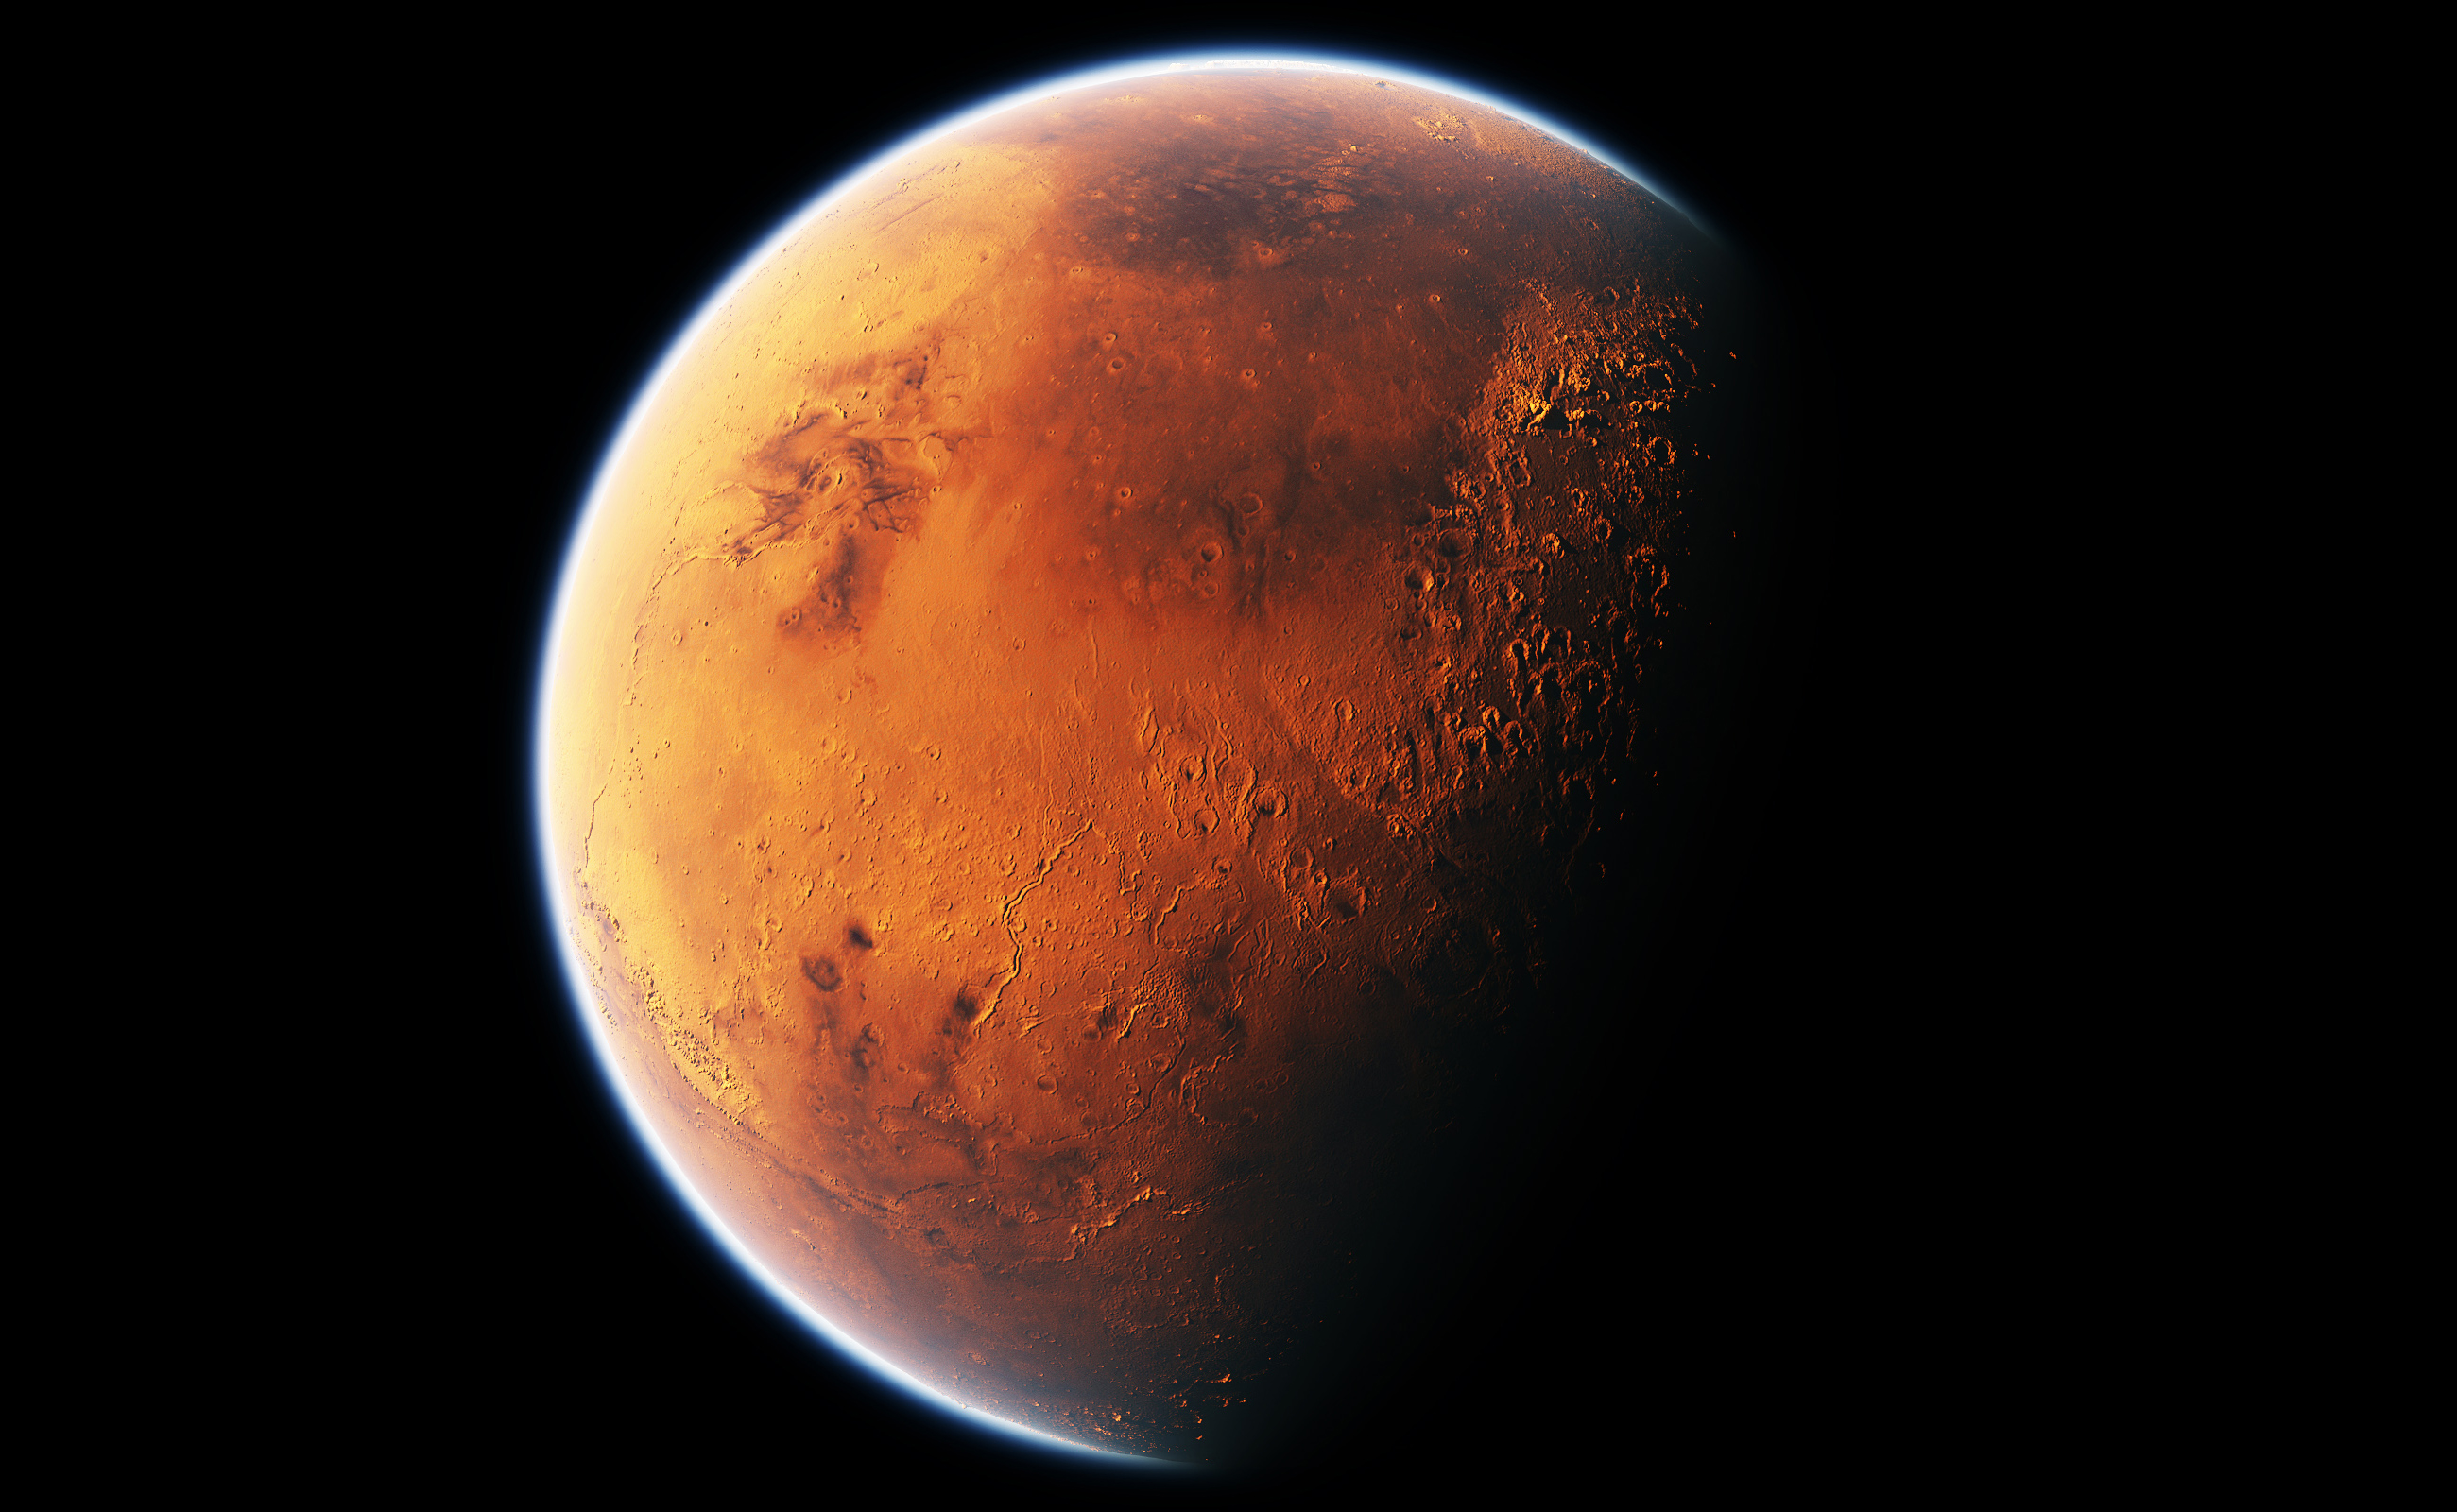 Mars Black wallpaper 2600x1600 132925 WallpaperUP 2600x1600